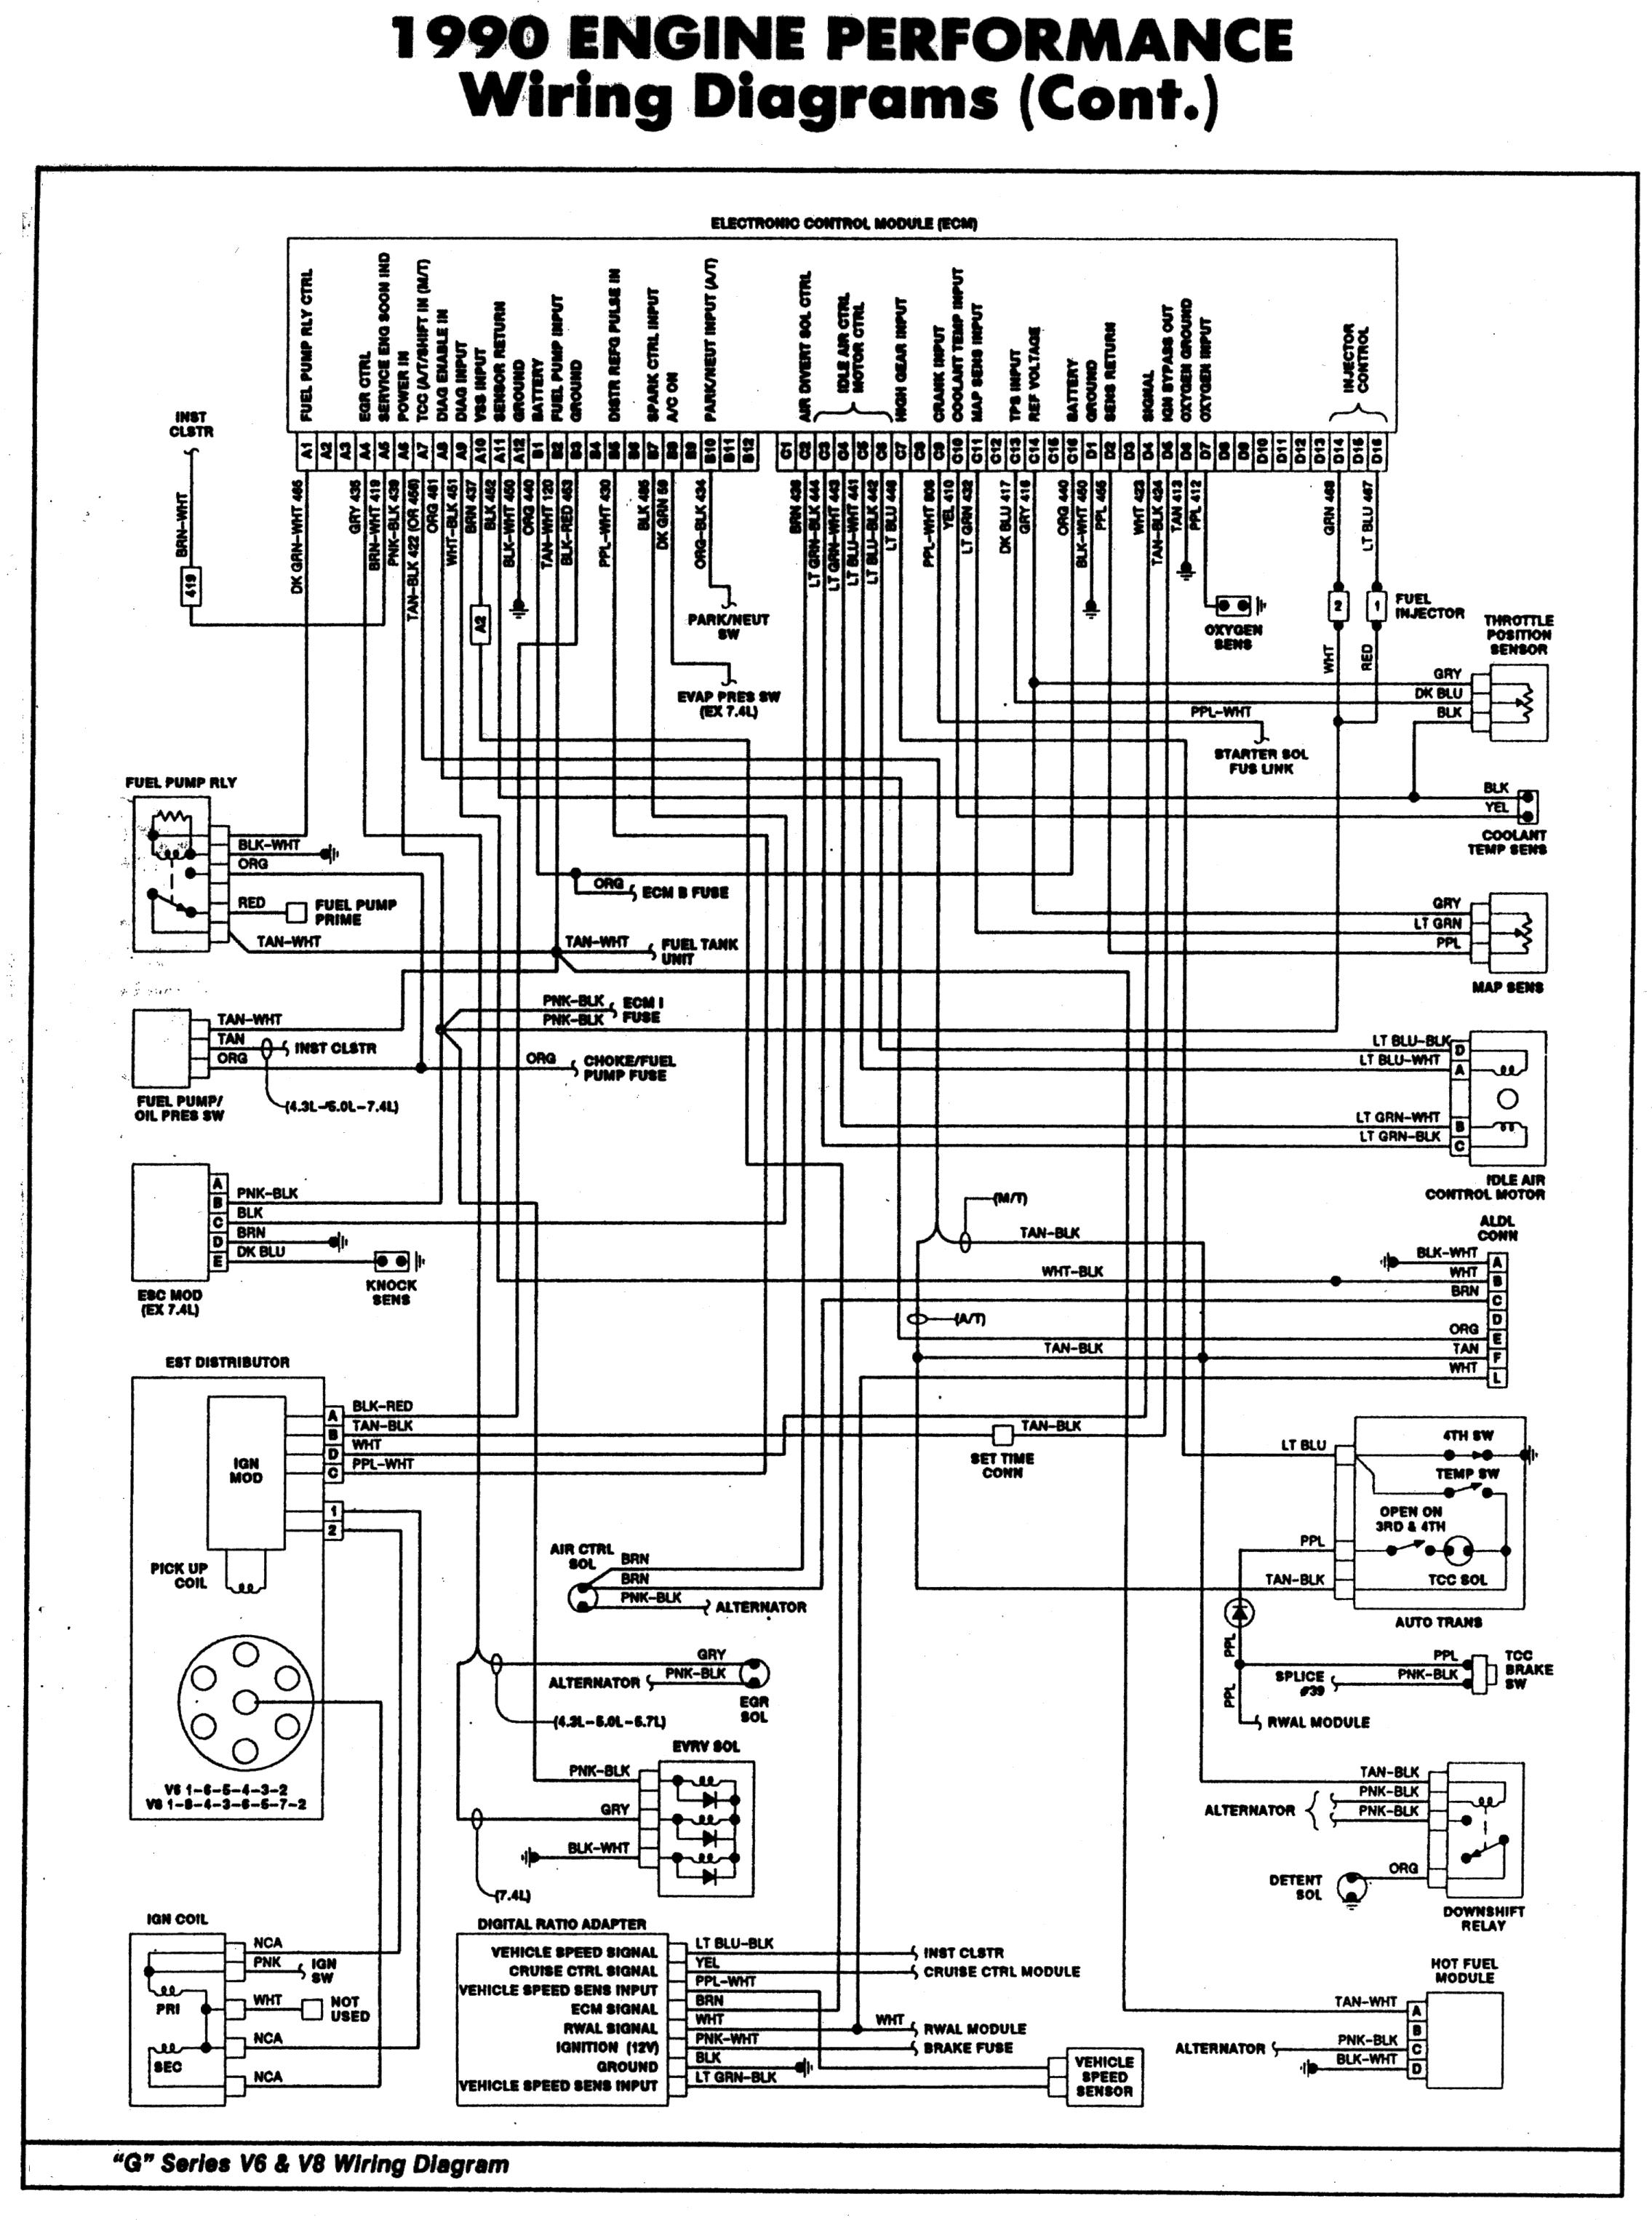 chevy 350 tbi wiring diagram wiring diagrams